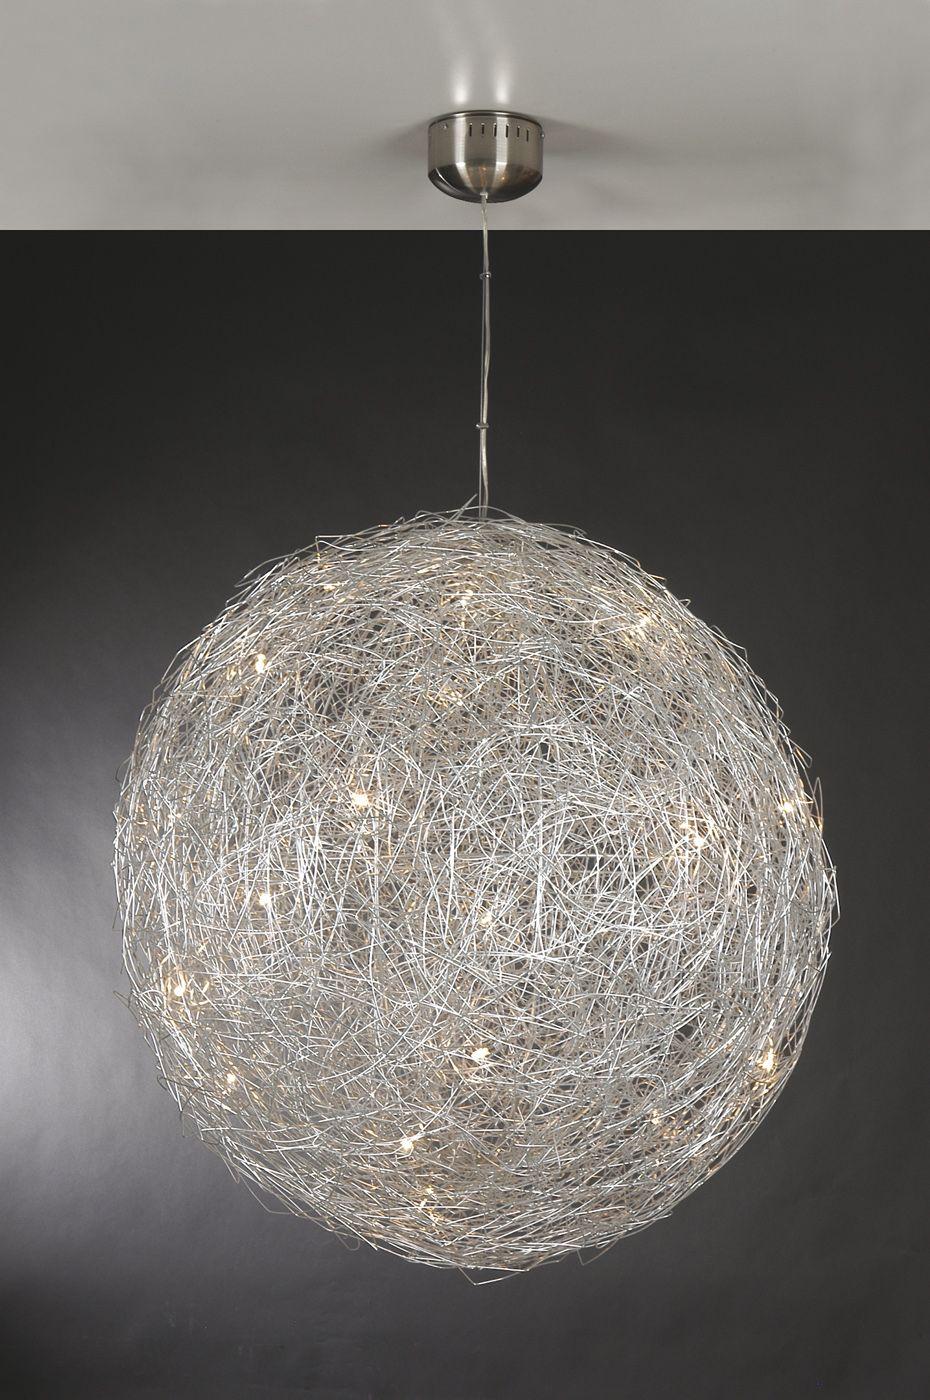 wireball lusters & verlichting www.teakpoint.be | VERLICHTING EN ...